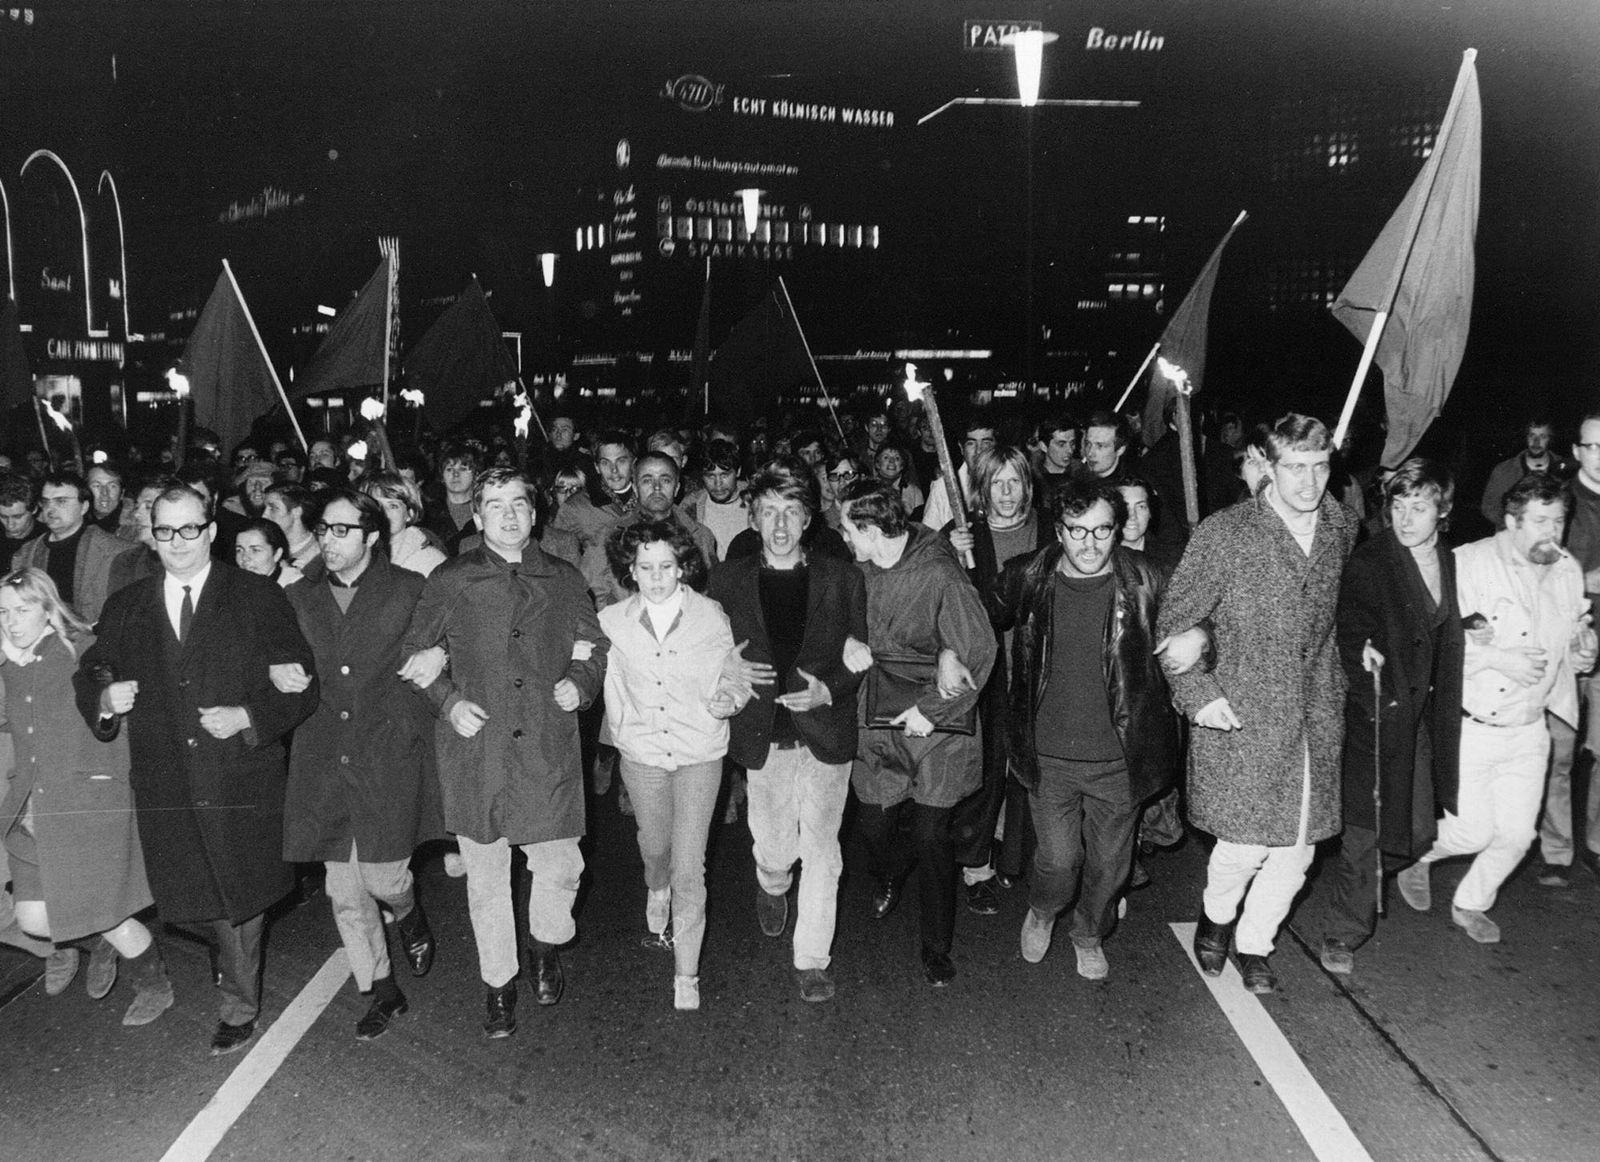 Springer / Protest / Blockade